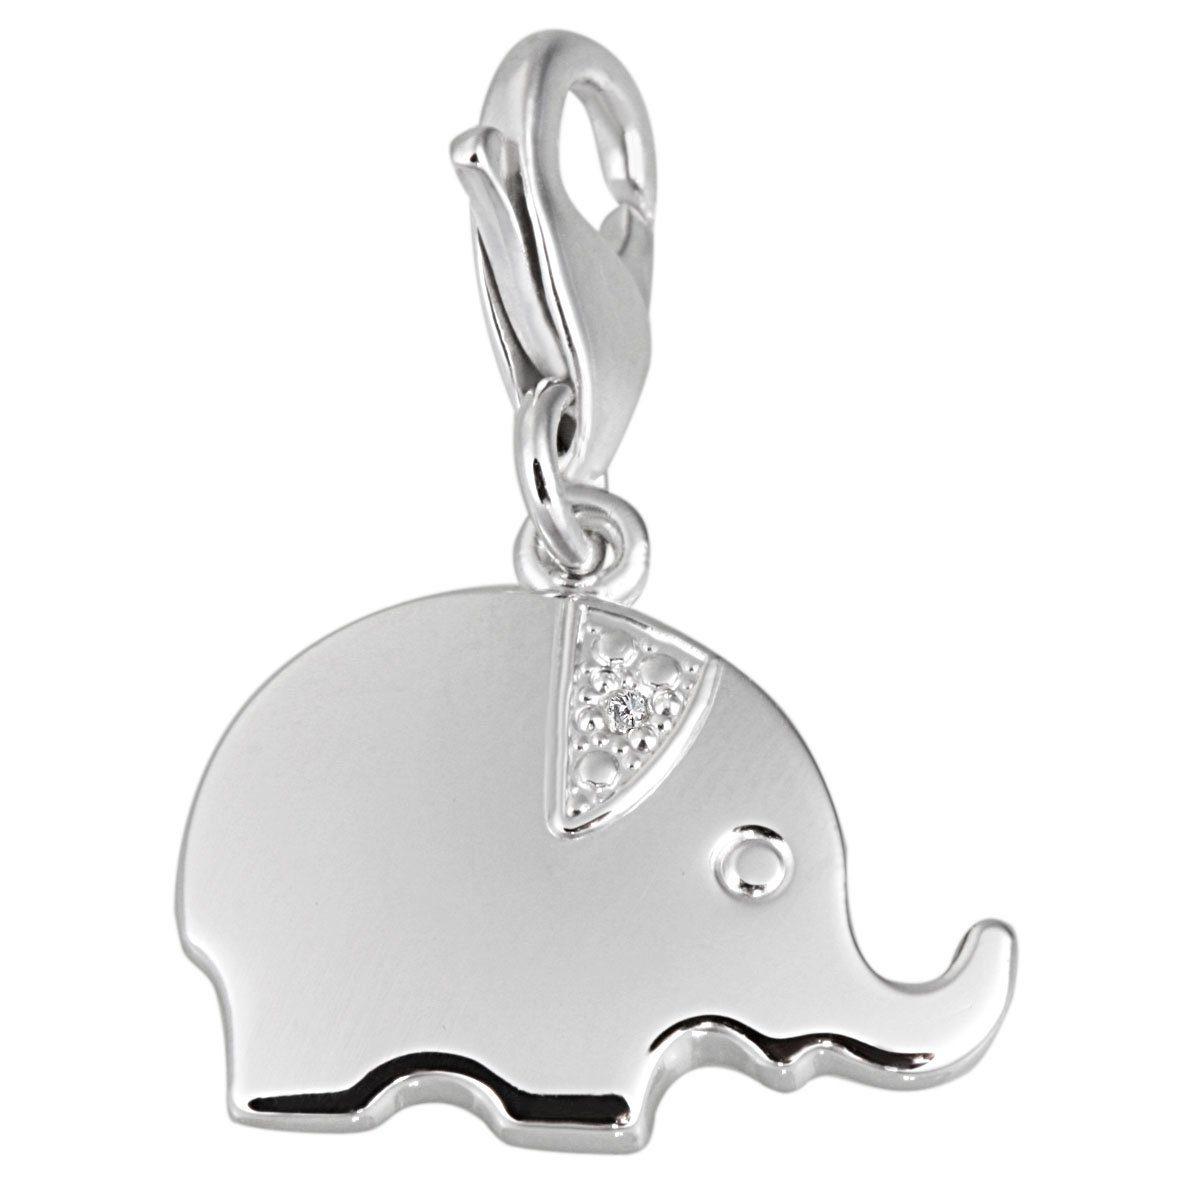 Averdin Charm Sterlingsilber 925/- mit 1 Zirkonia Elefant